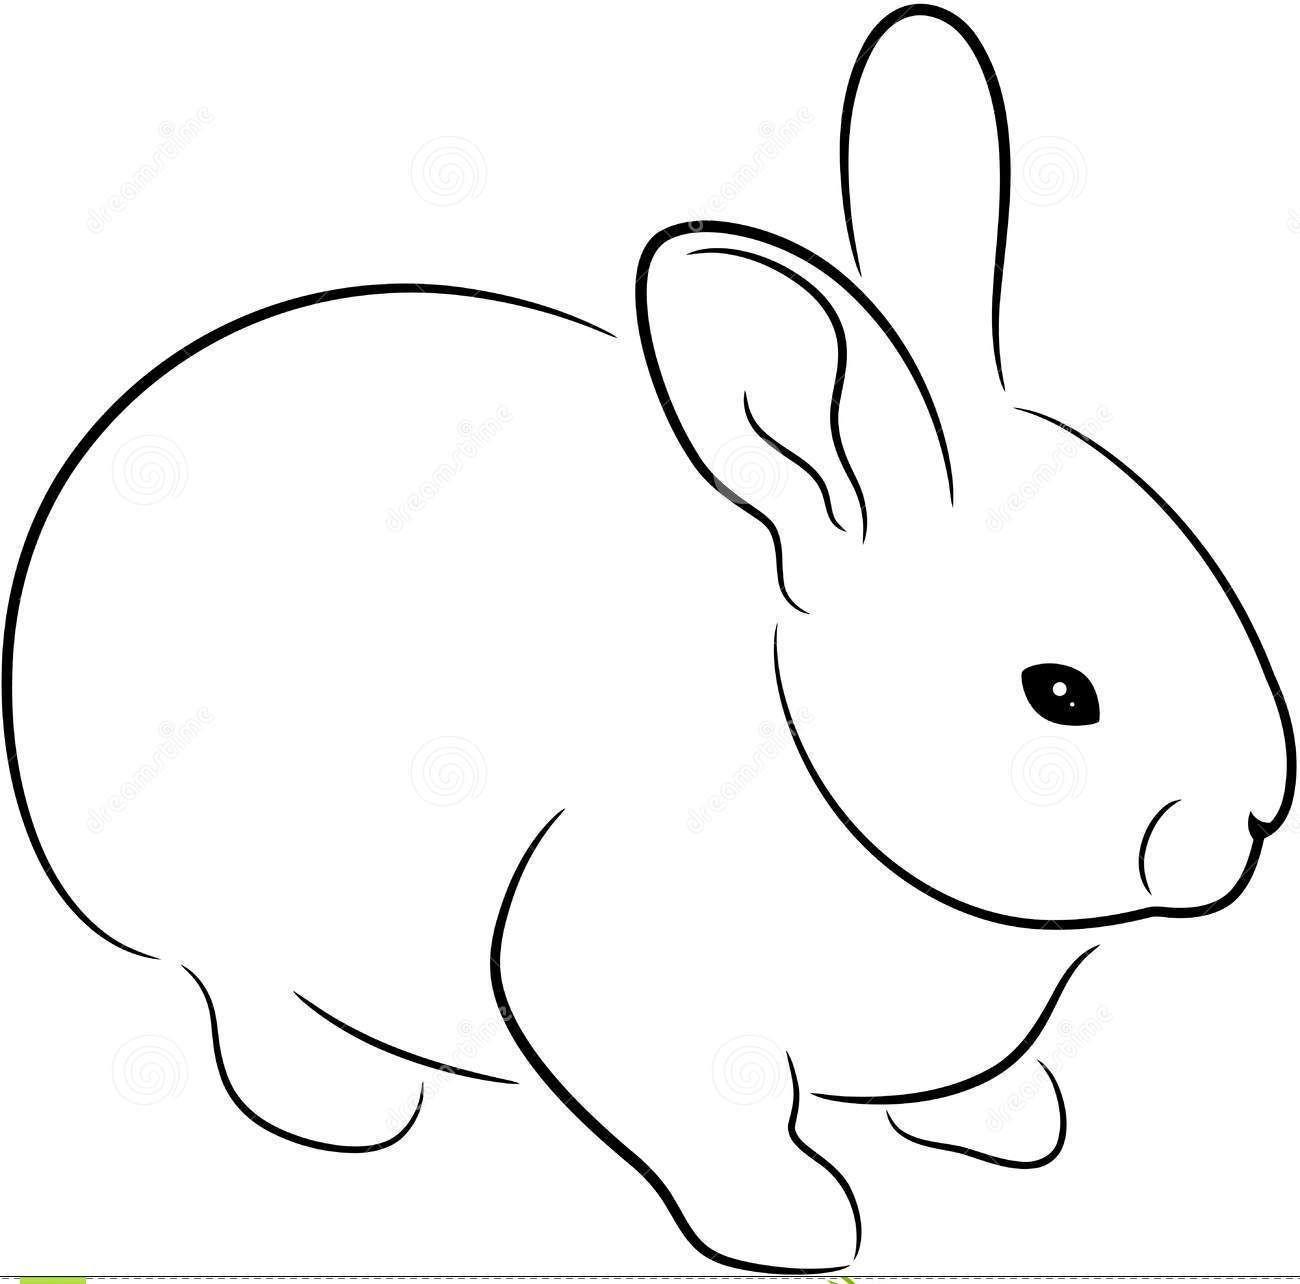 Black Outline Rabbit Tattoo Design